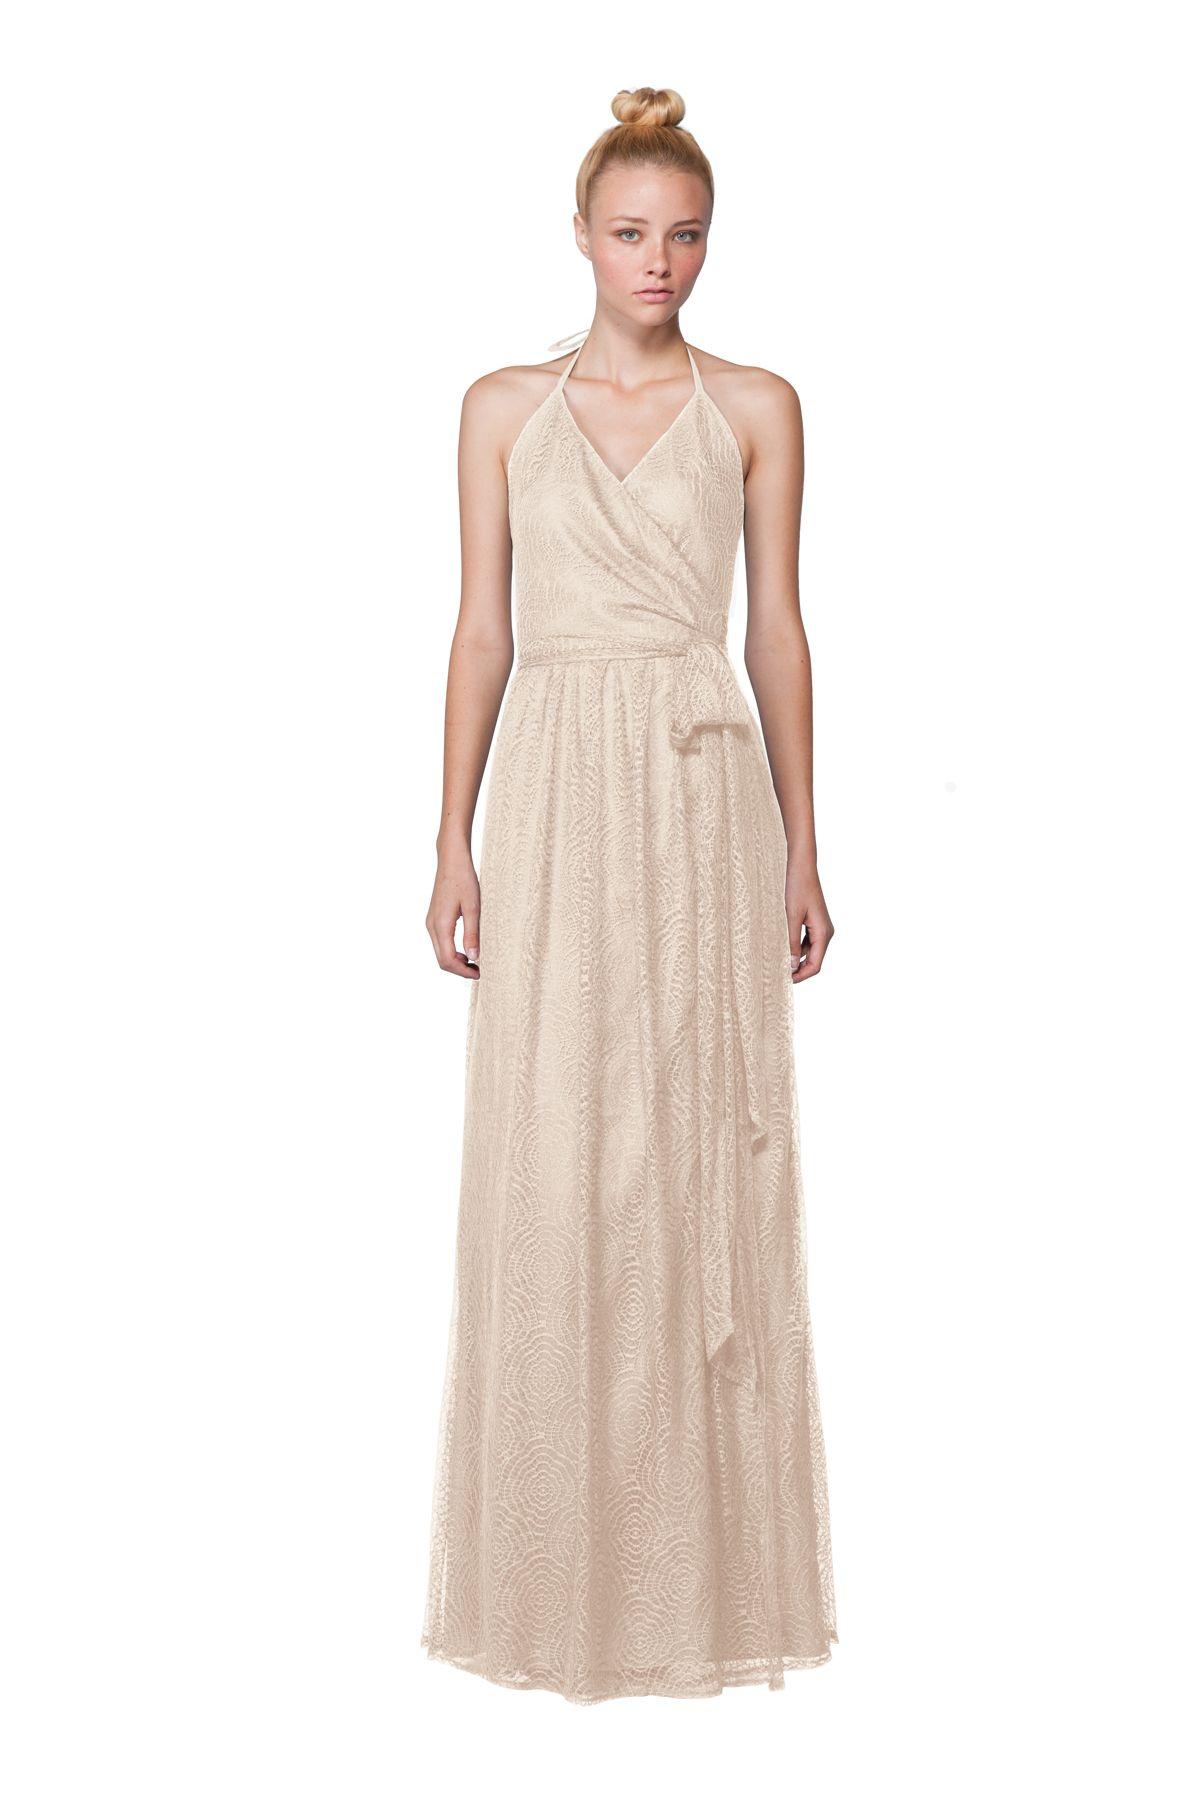 Joanna august dc dress long lace bridesmaid dress in champagne joanna august dc dress long lace bridesmaid dress in champagne full length ombrellifo Choice Image